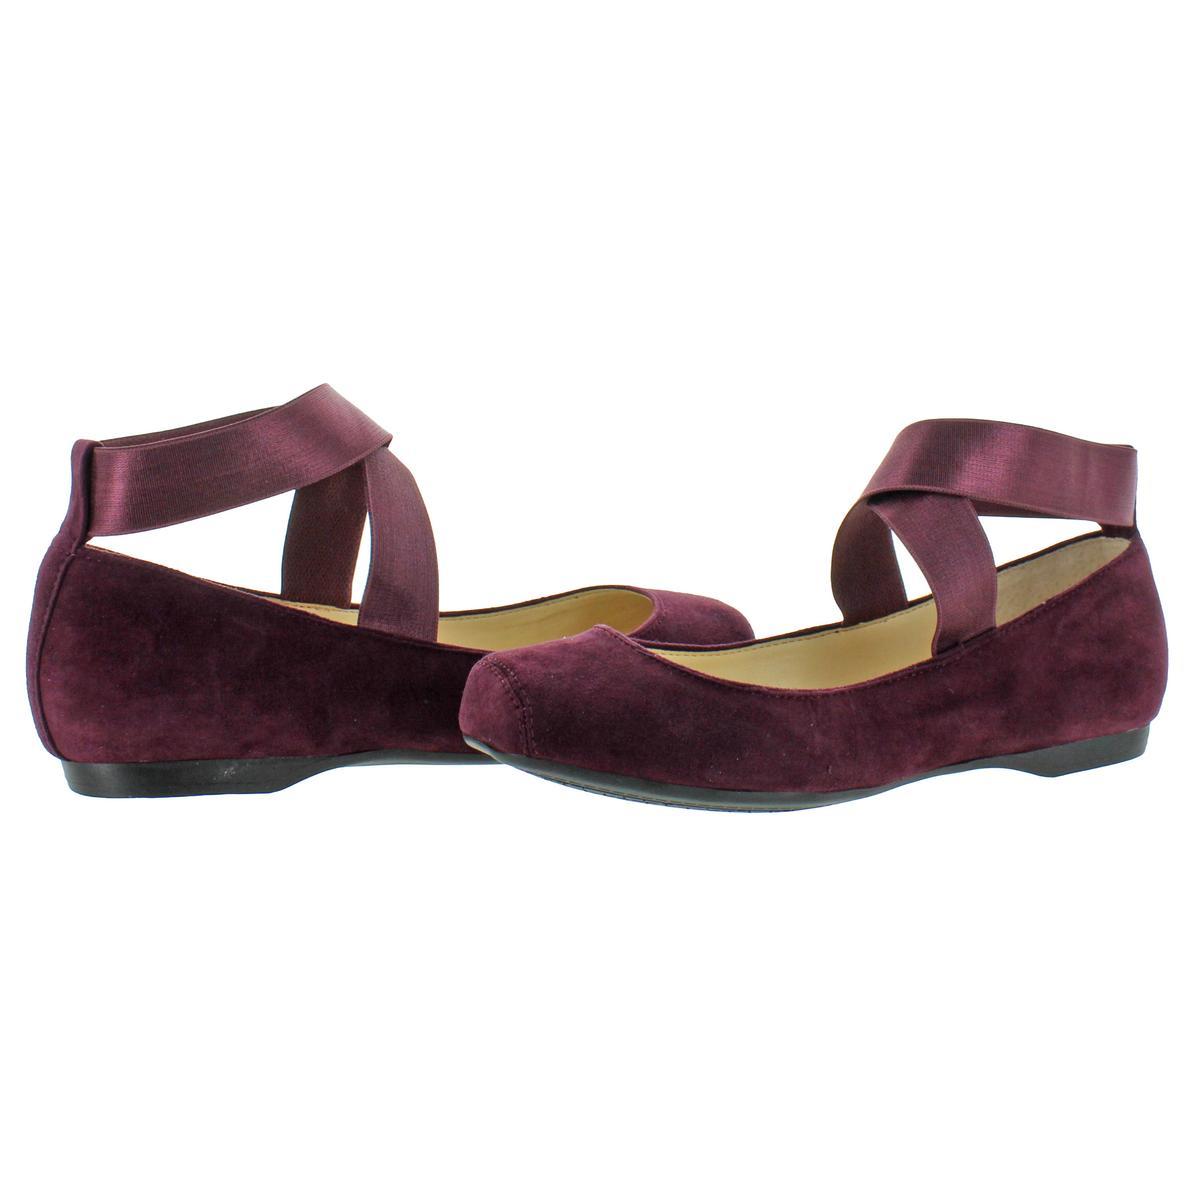 Jessica-Simpson-Women-039-s-Mandalaye-Square-Toe-Ankle-Wrap-Ballet-Flats thumbnail 23